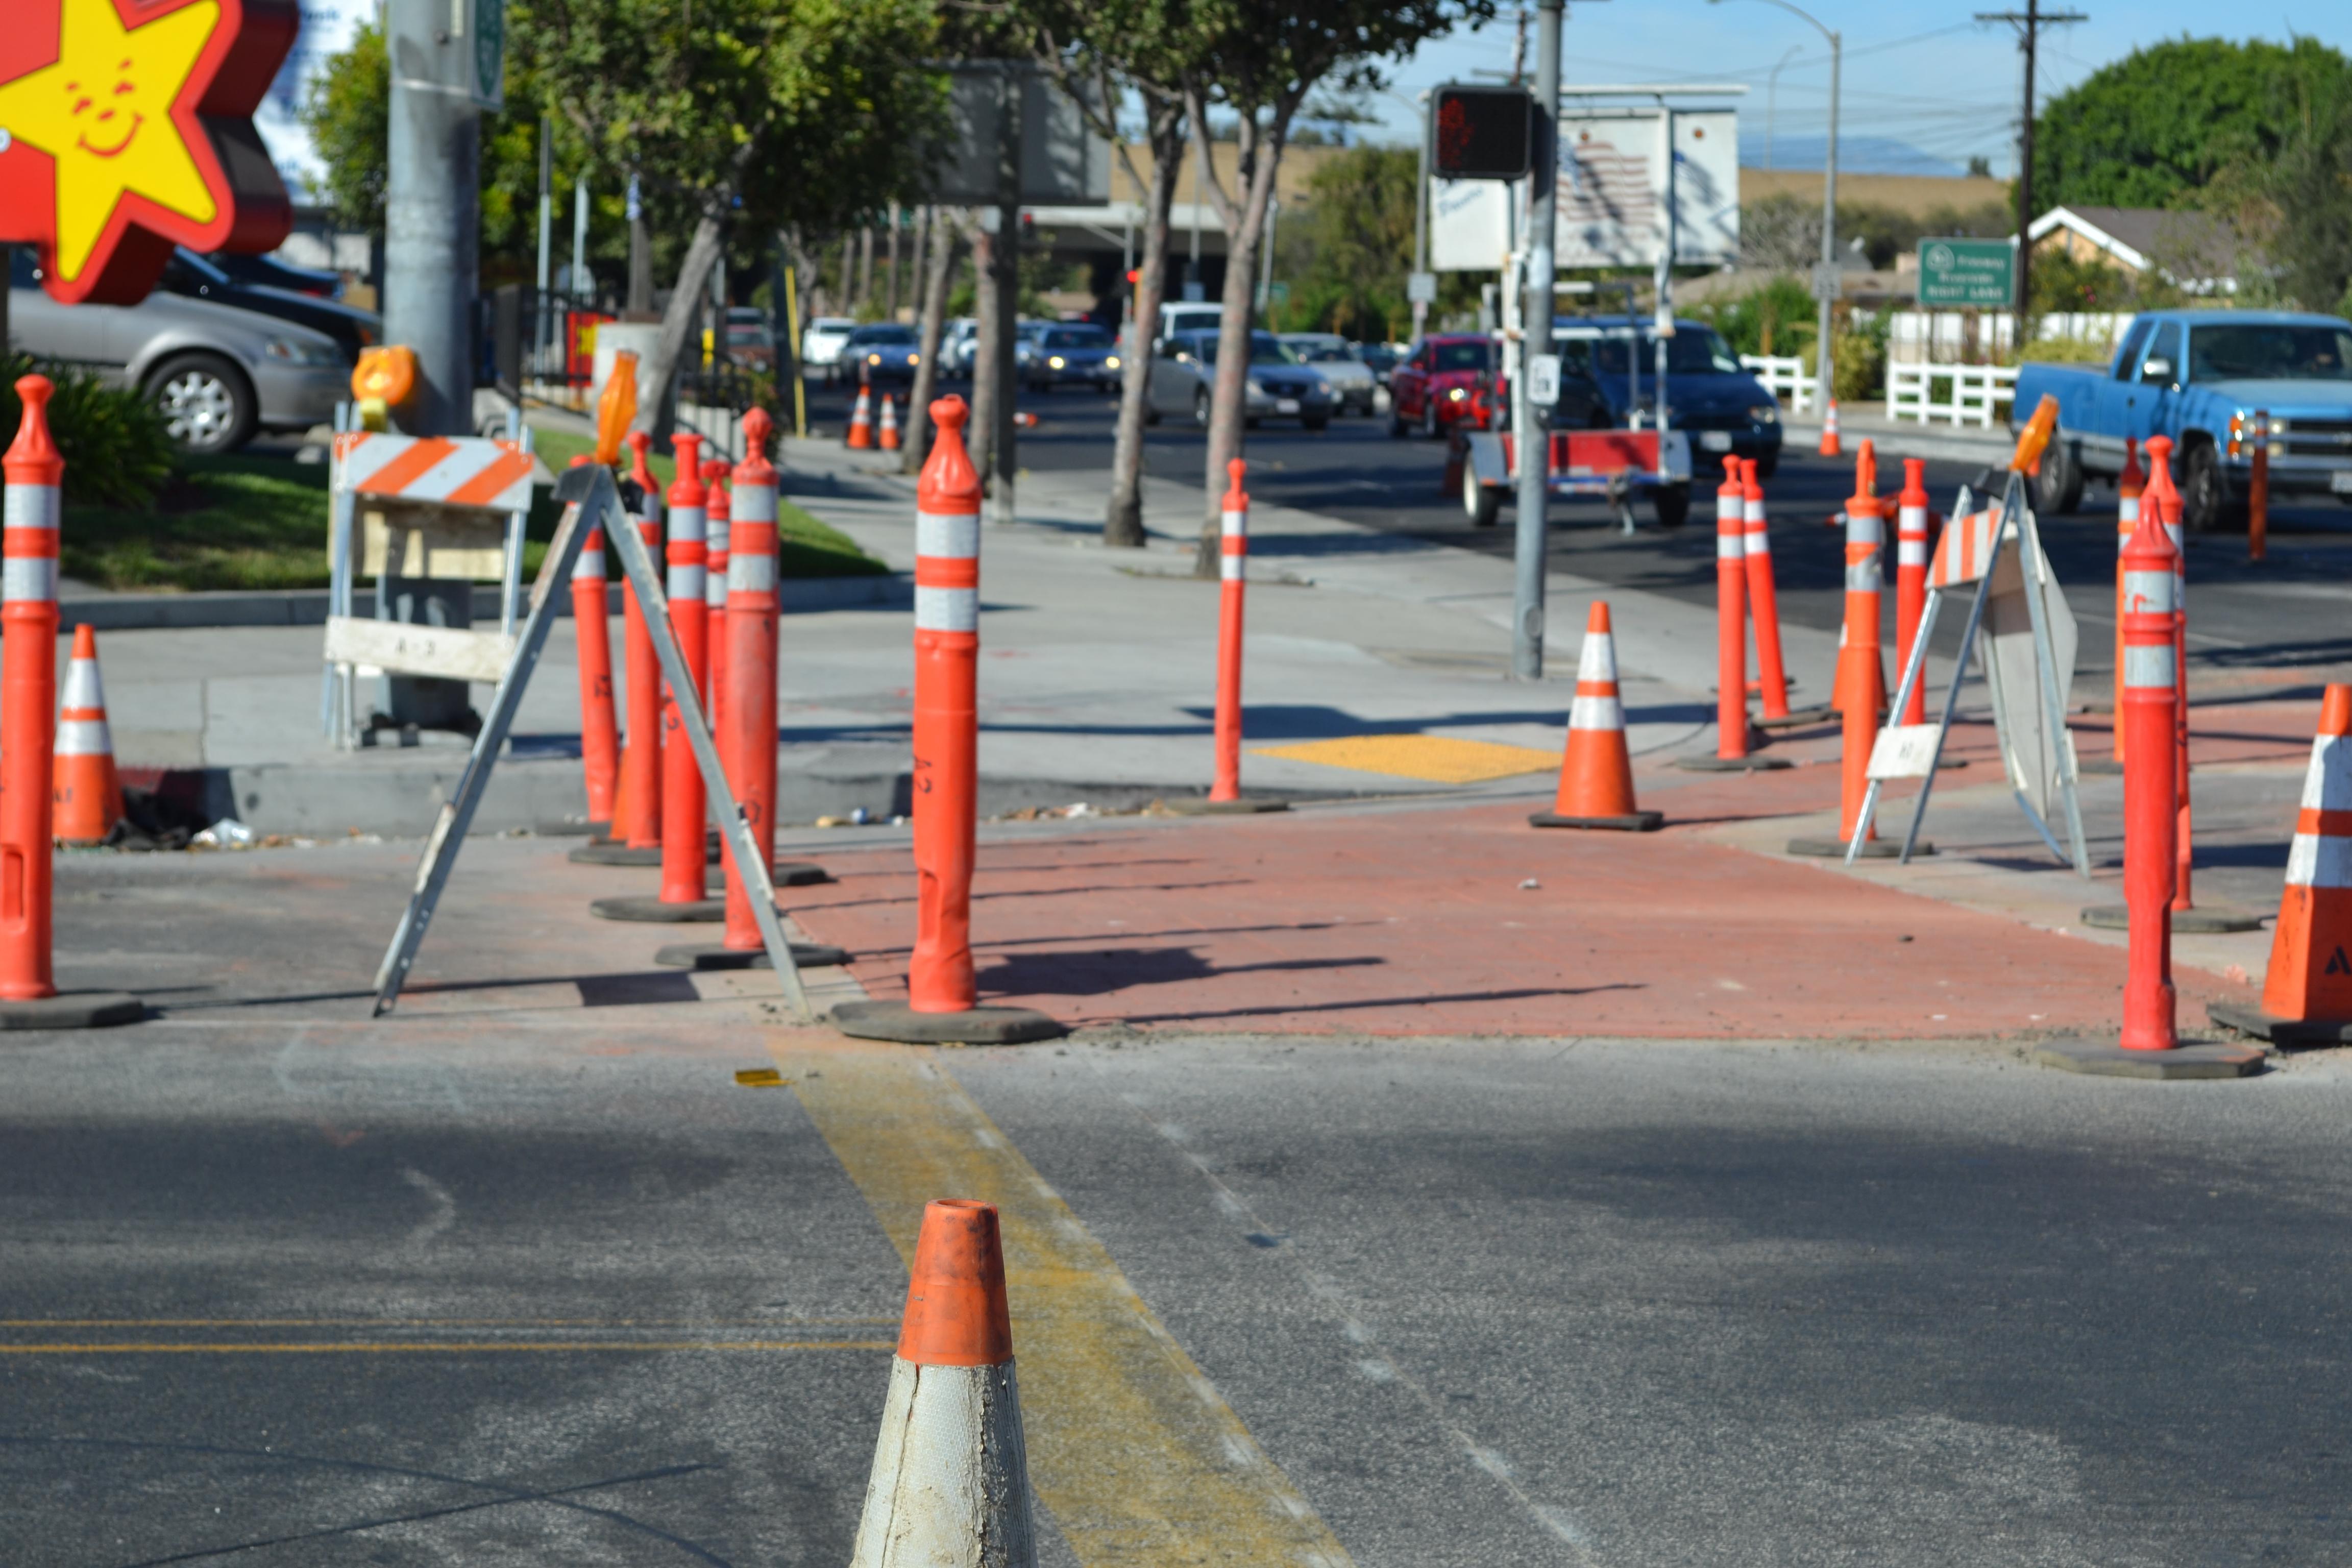 Complete_Streets__2.JPG